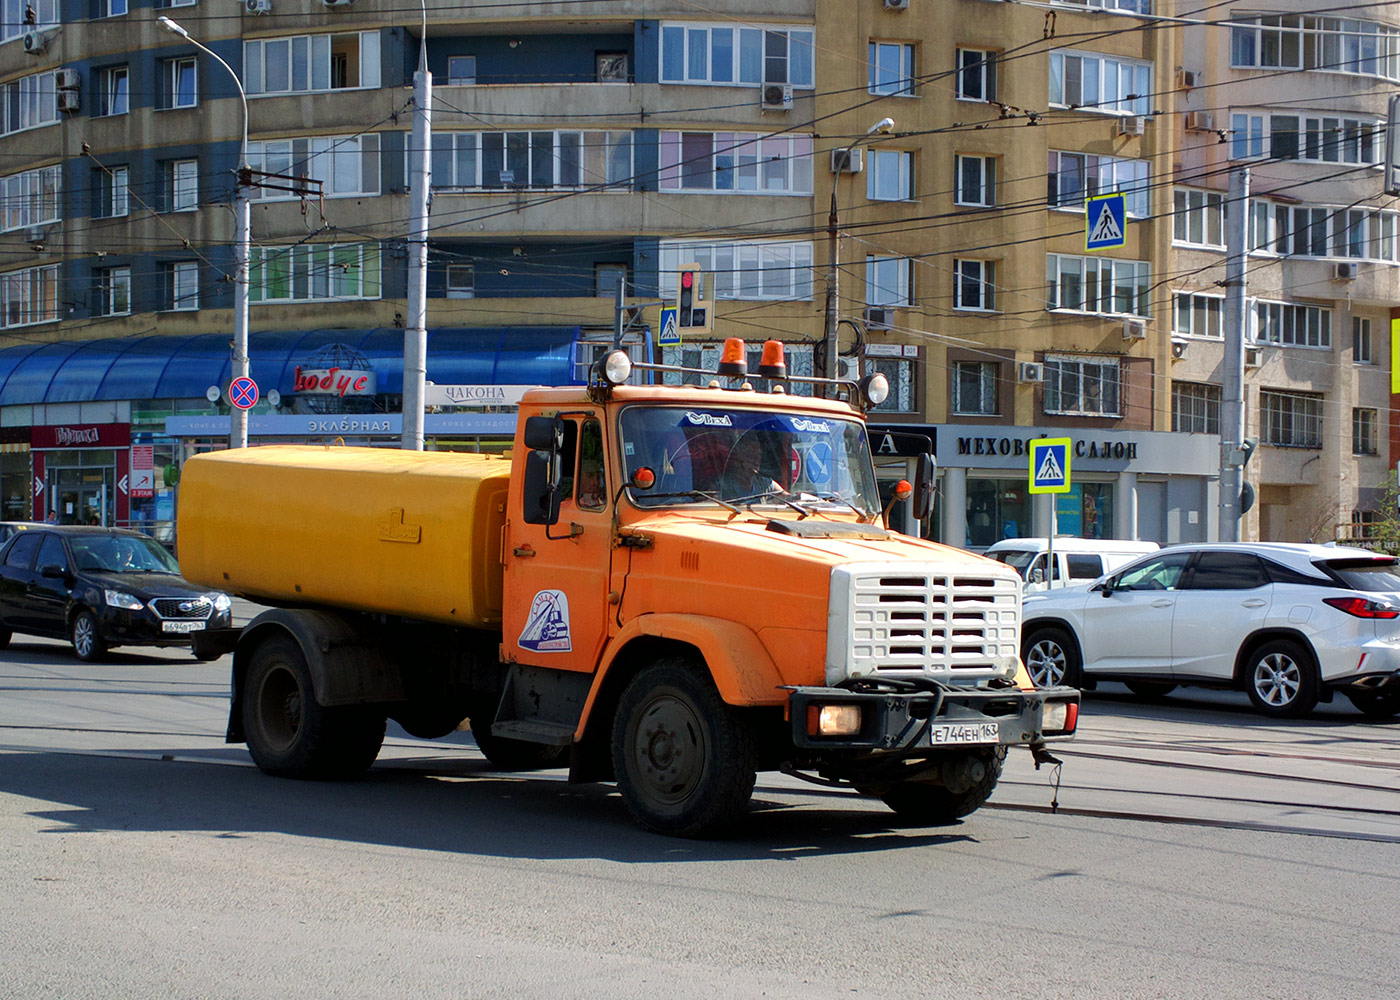 Поливомоечная машина КО-713 на шасси ЗиЛ-433362 #Е744ЕН163. г. Самара, ул. Полевая